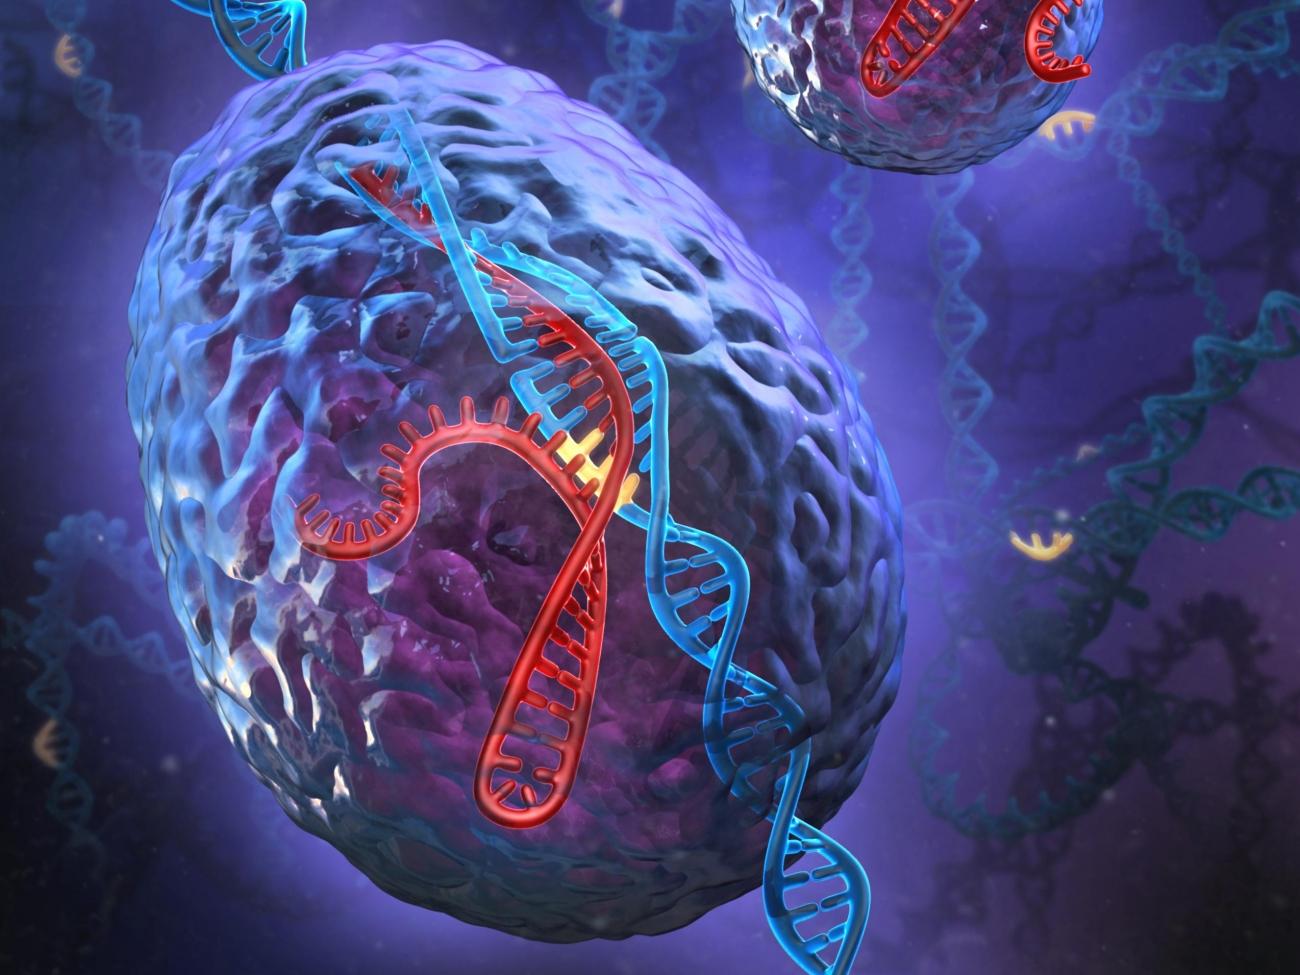 Editas stock jumps after Broad wins CRISPR patent fight